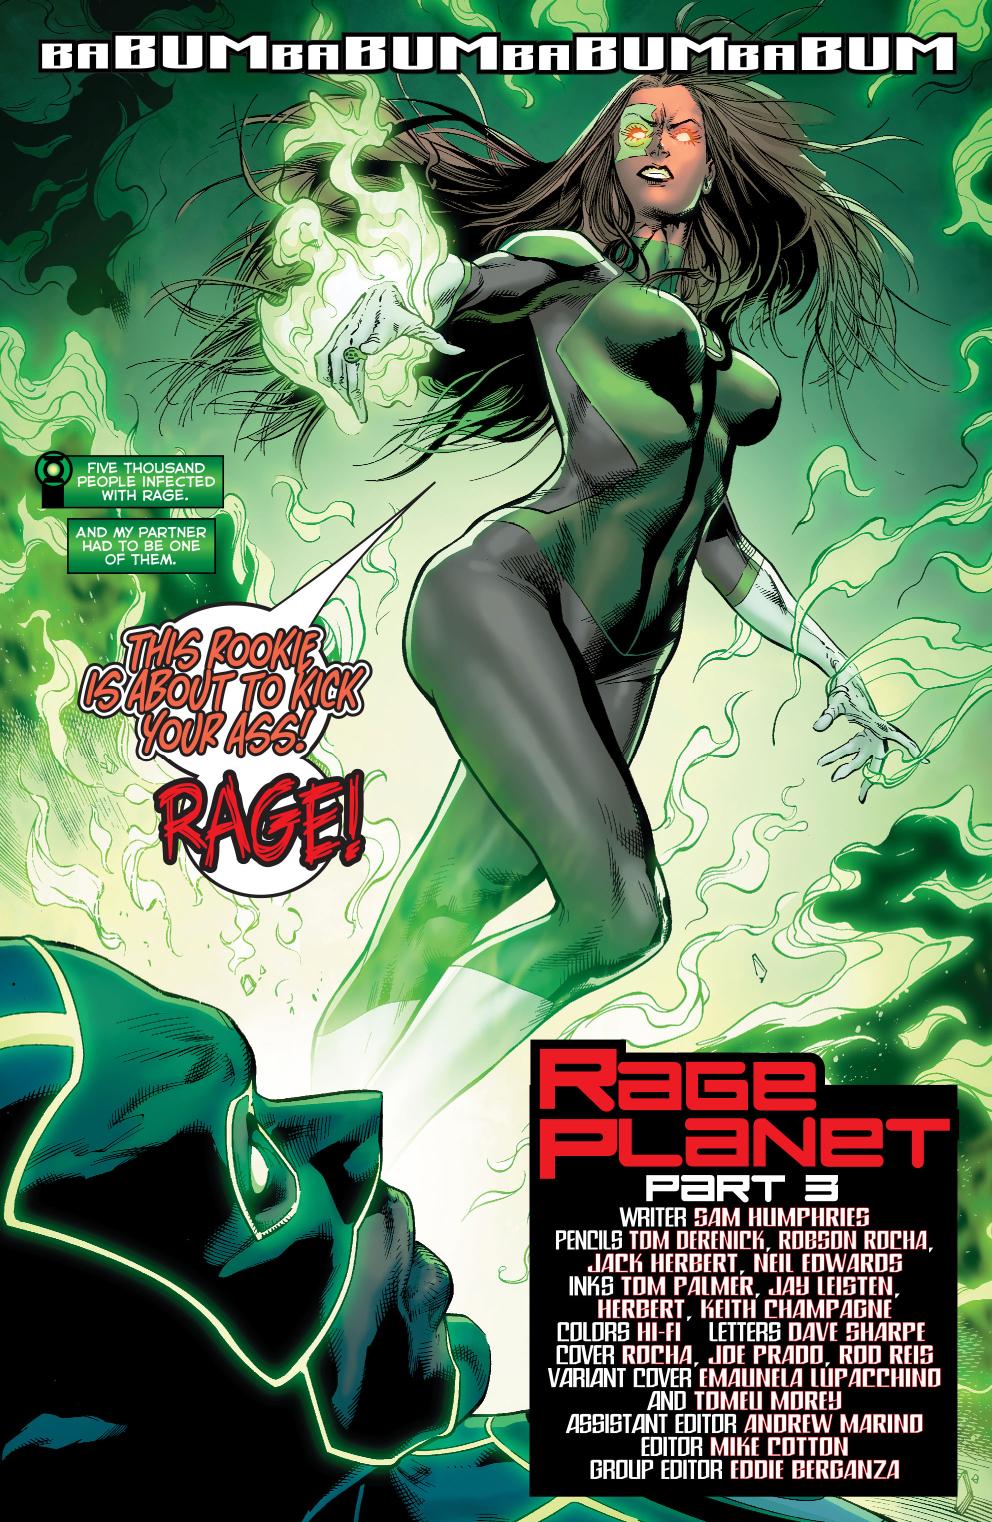 green-lantern-jessica-cruz-infected-with-rage